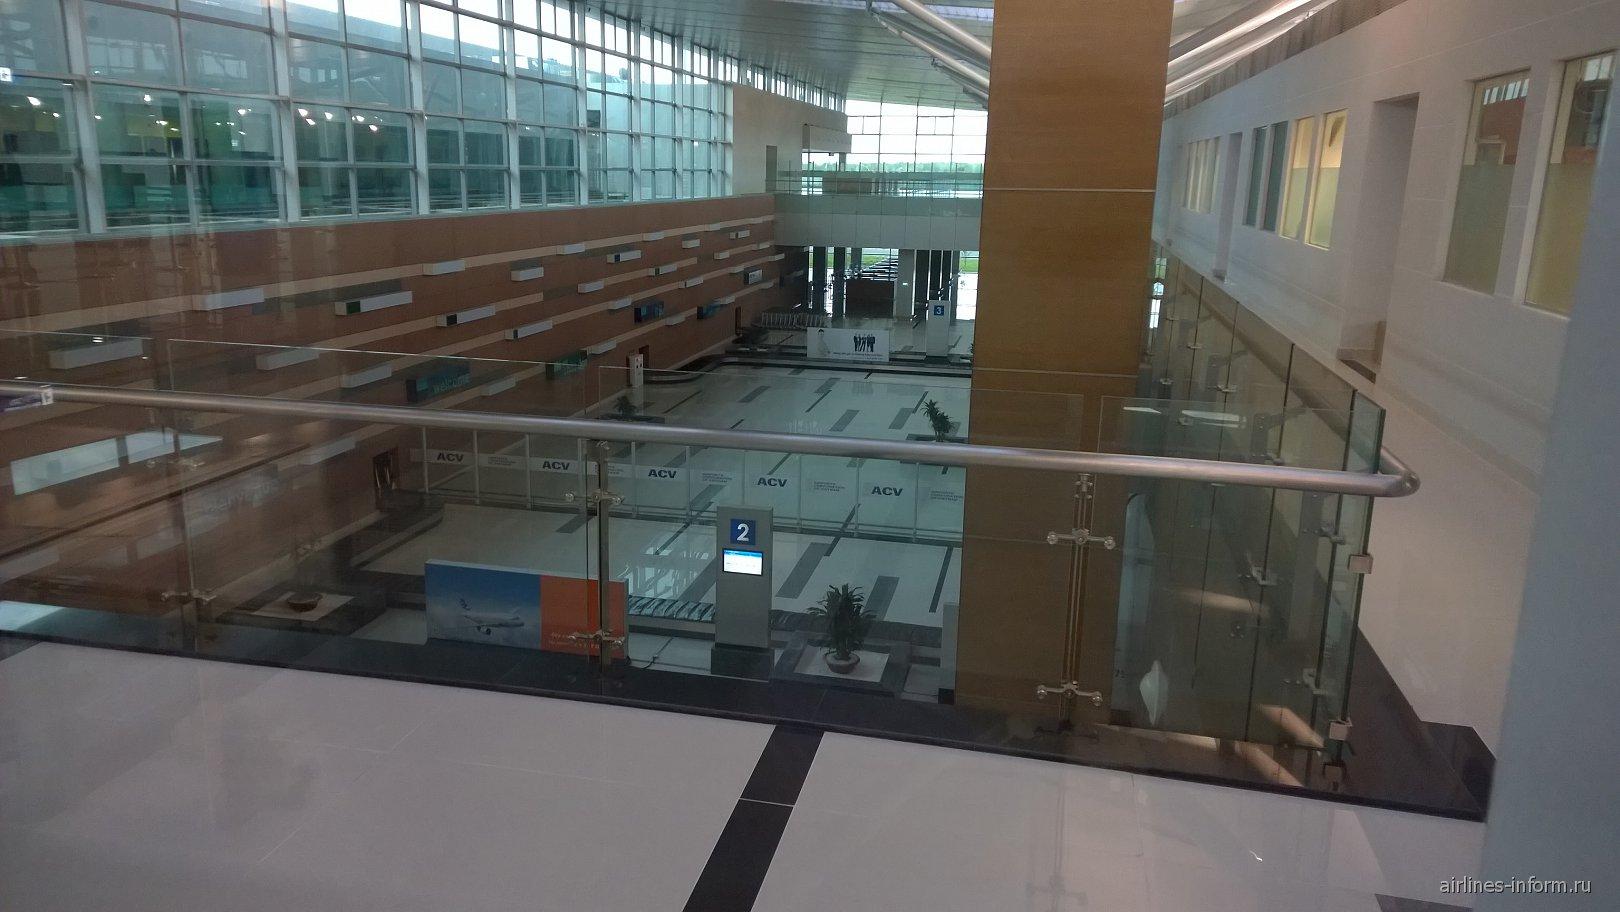 Вид на зону выдачи багажа в аэропорту Фукуок